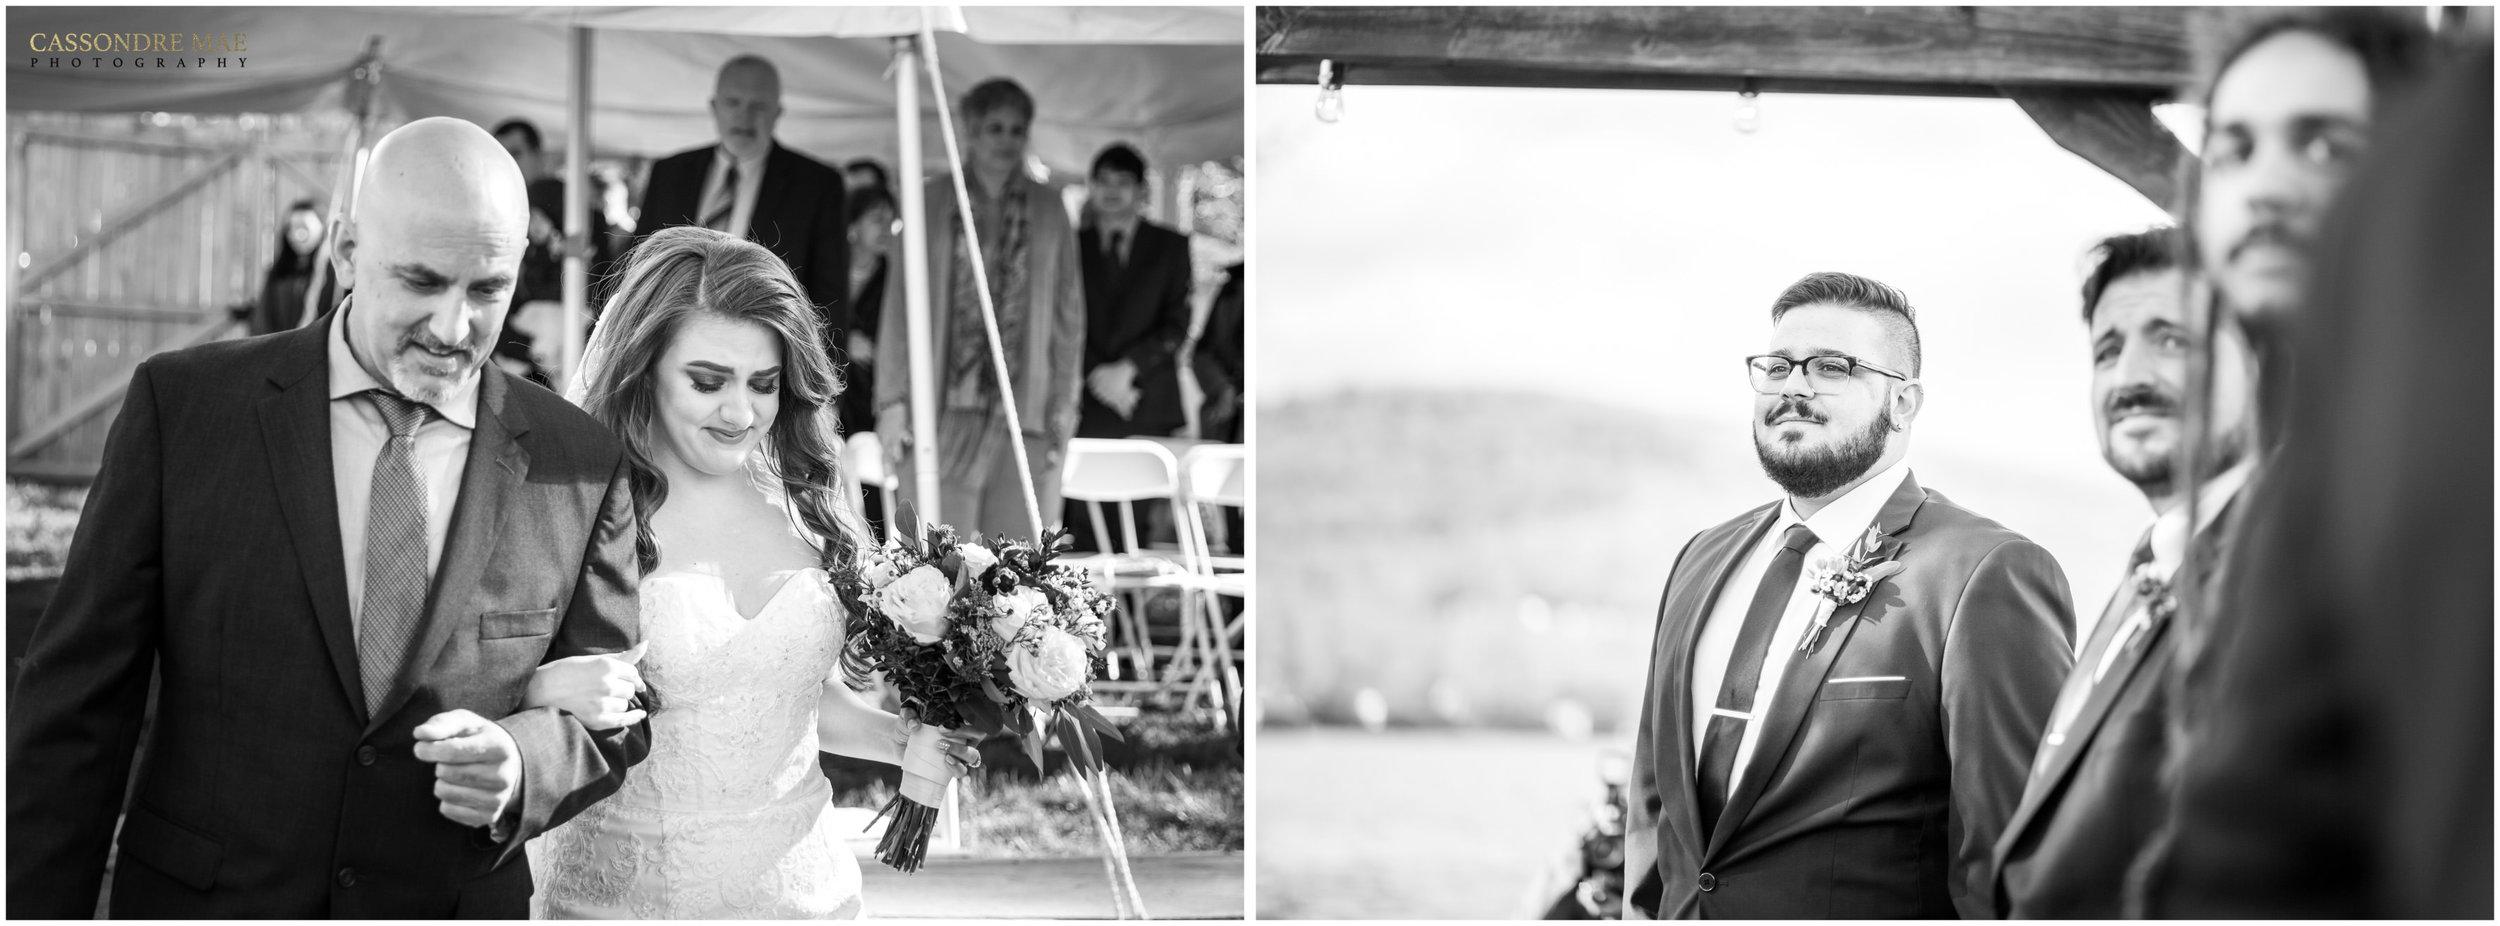 Cassondre Mae Photography Cove Castle Weddings 27.jpg